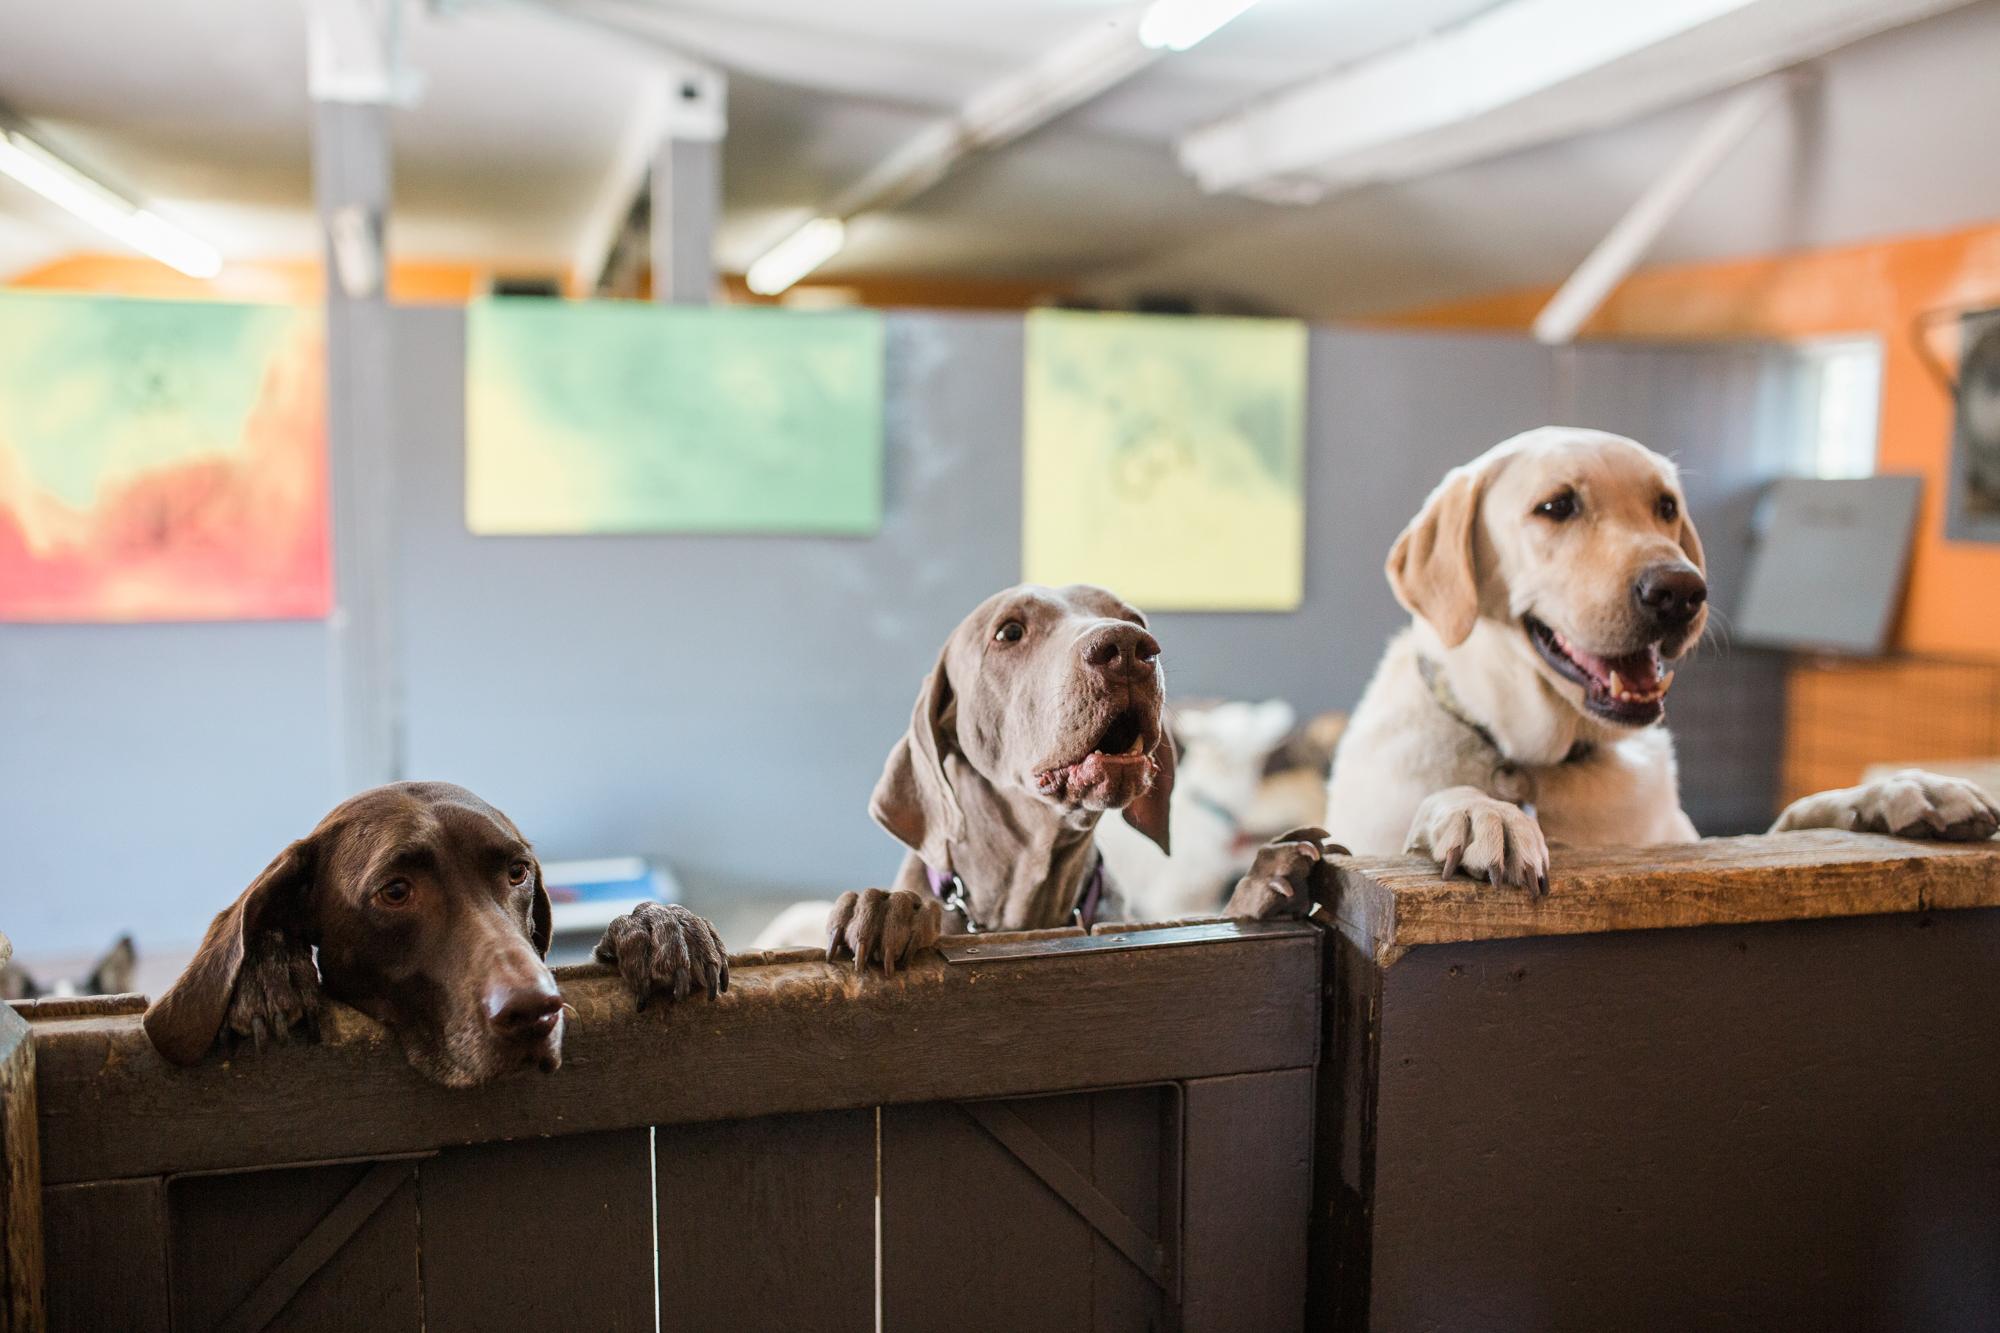 Barking-Good-Dogs-42.jpg